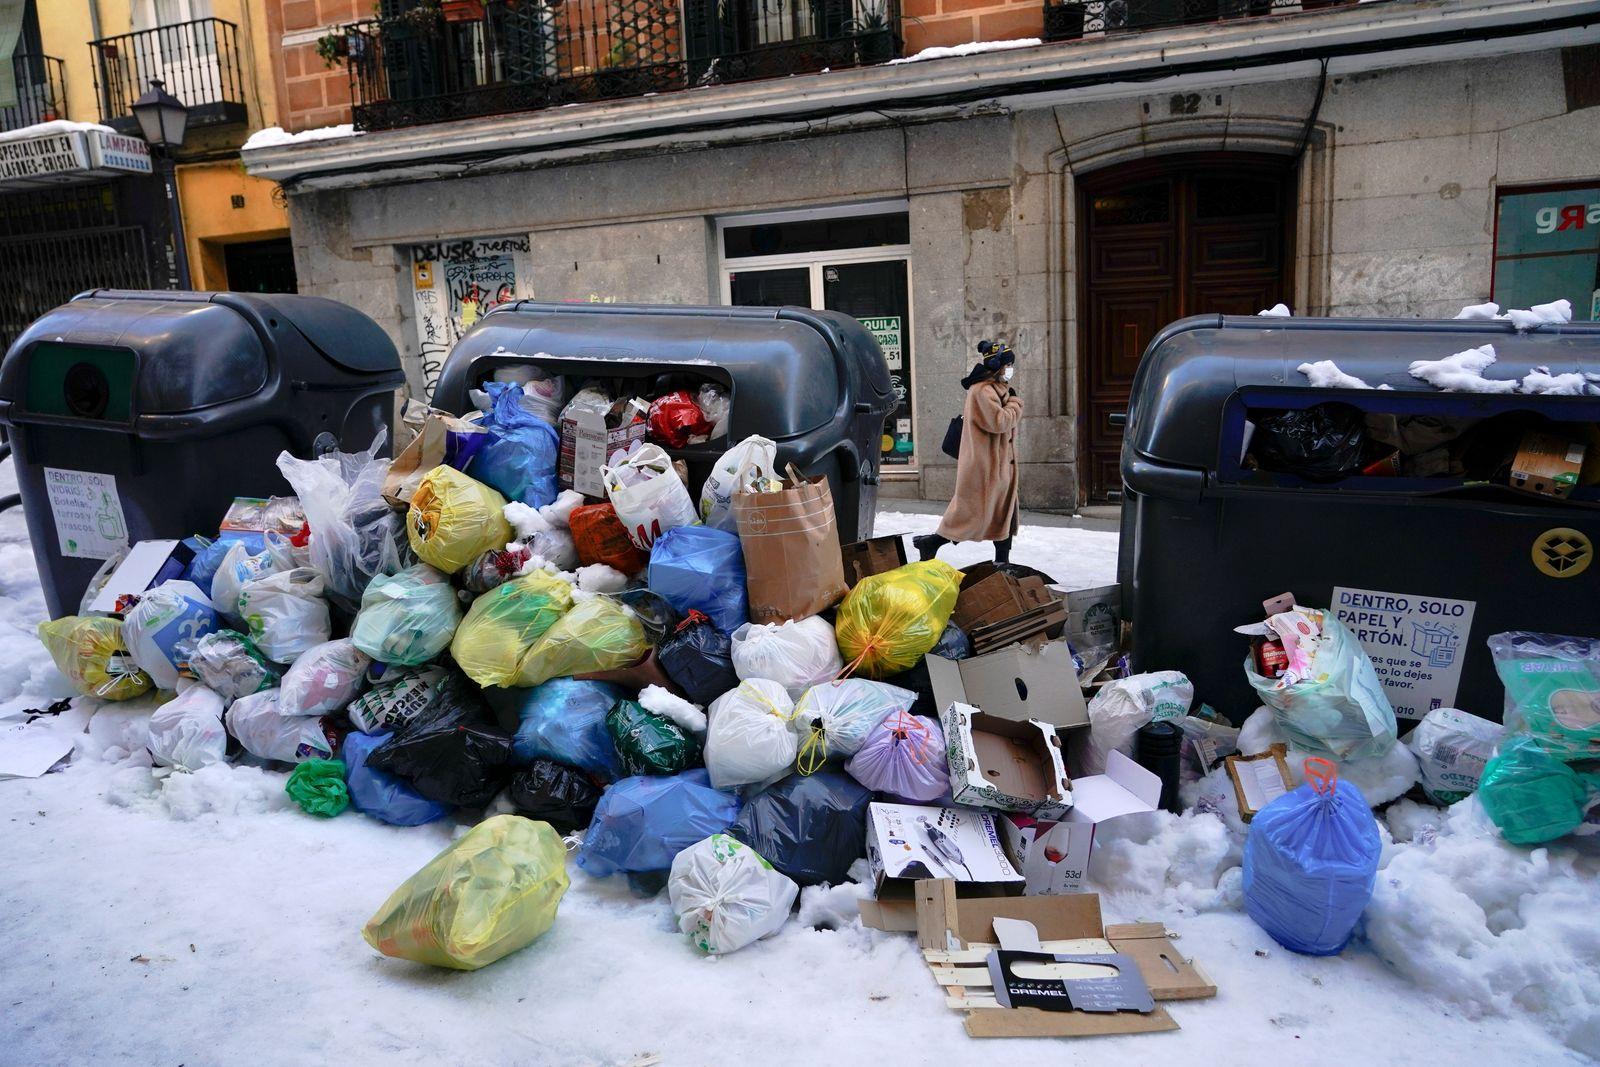 Heavy snowfall in Madrid